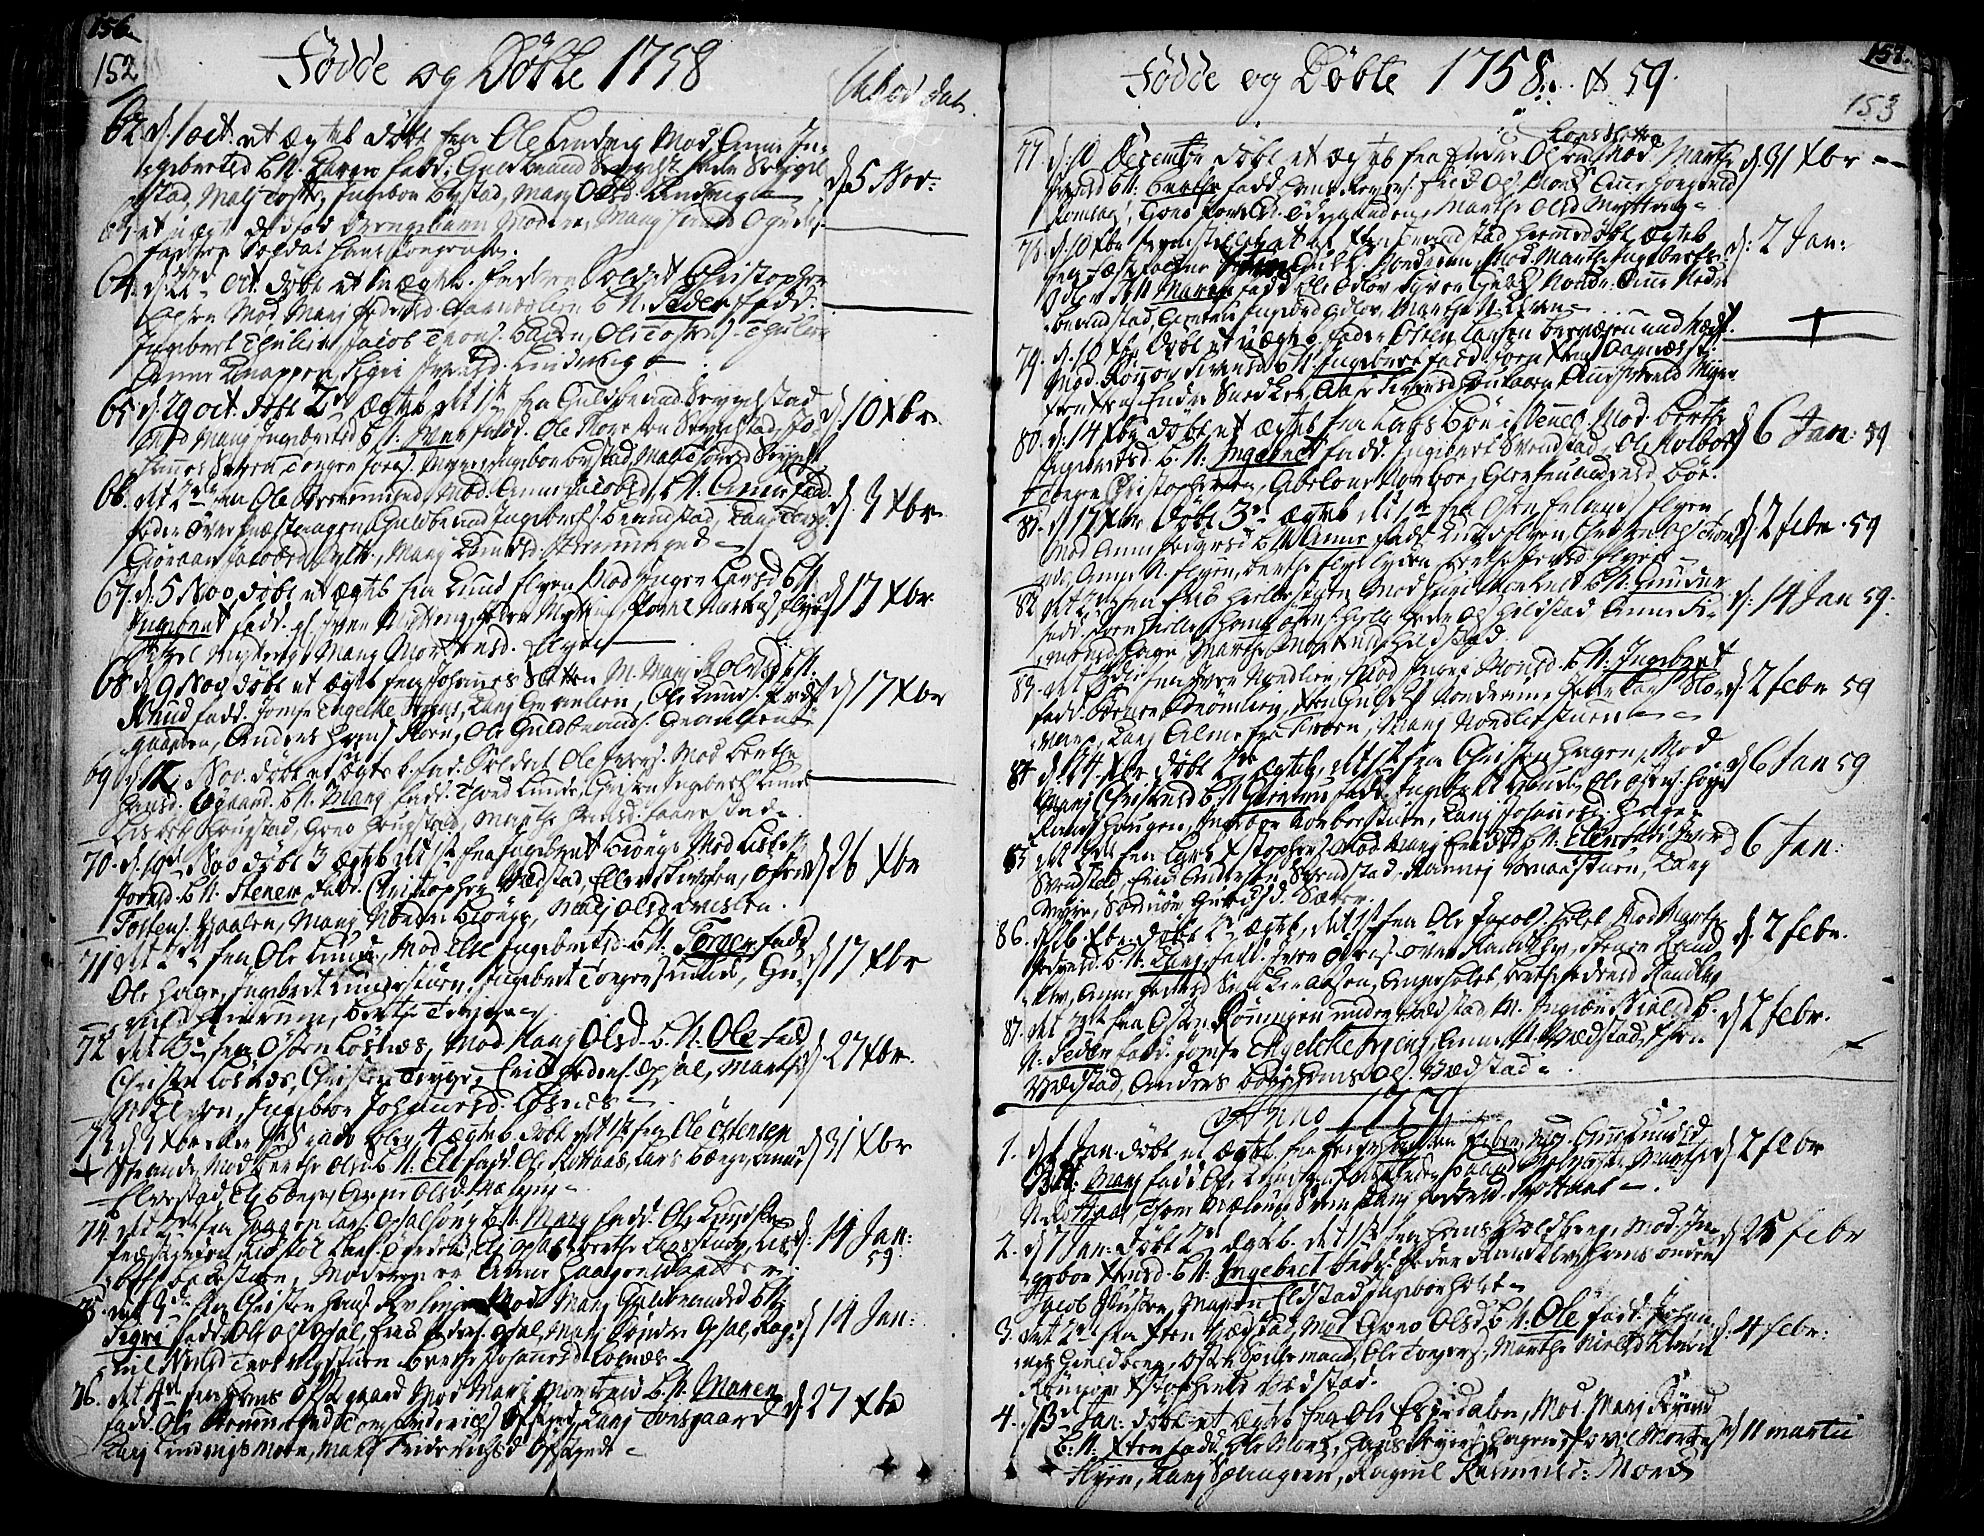 SAH, Ringebu prestekontor, Ministerialbok nr. 2, 1734-1780, s. 152-153